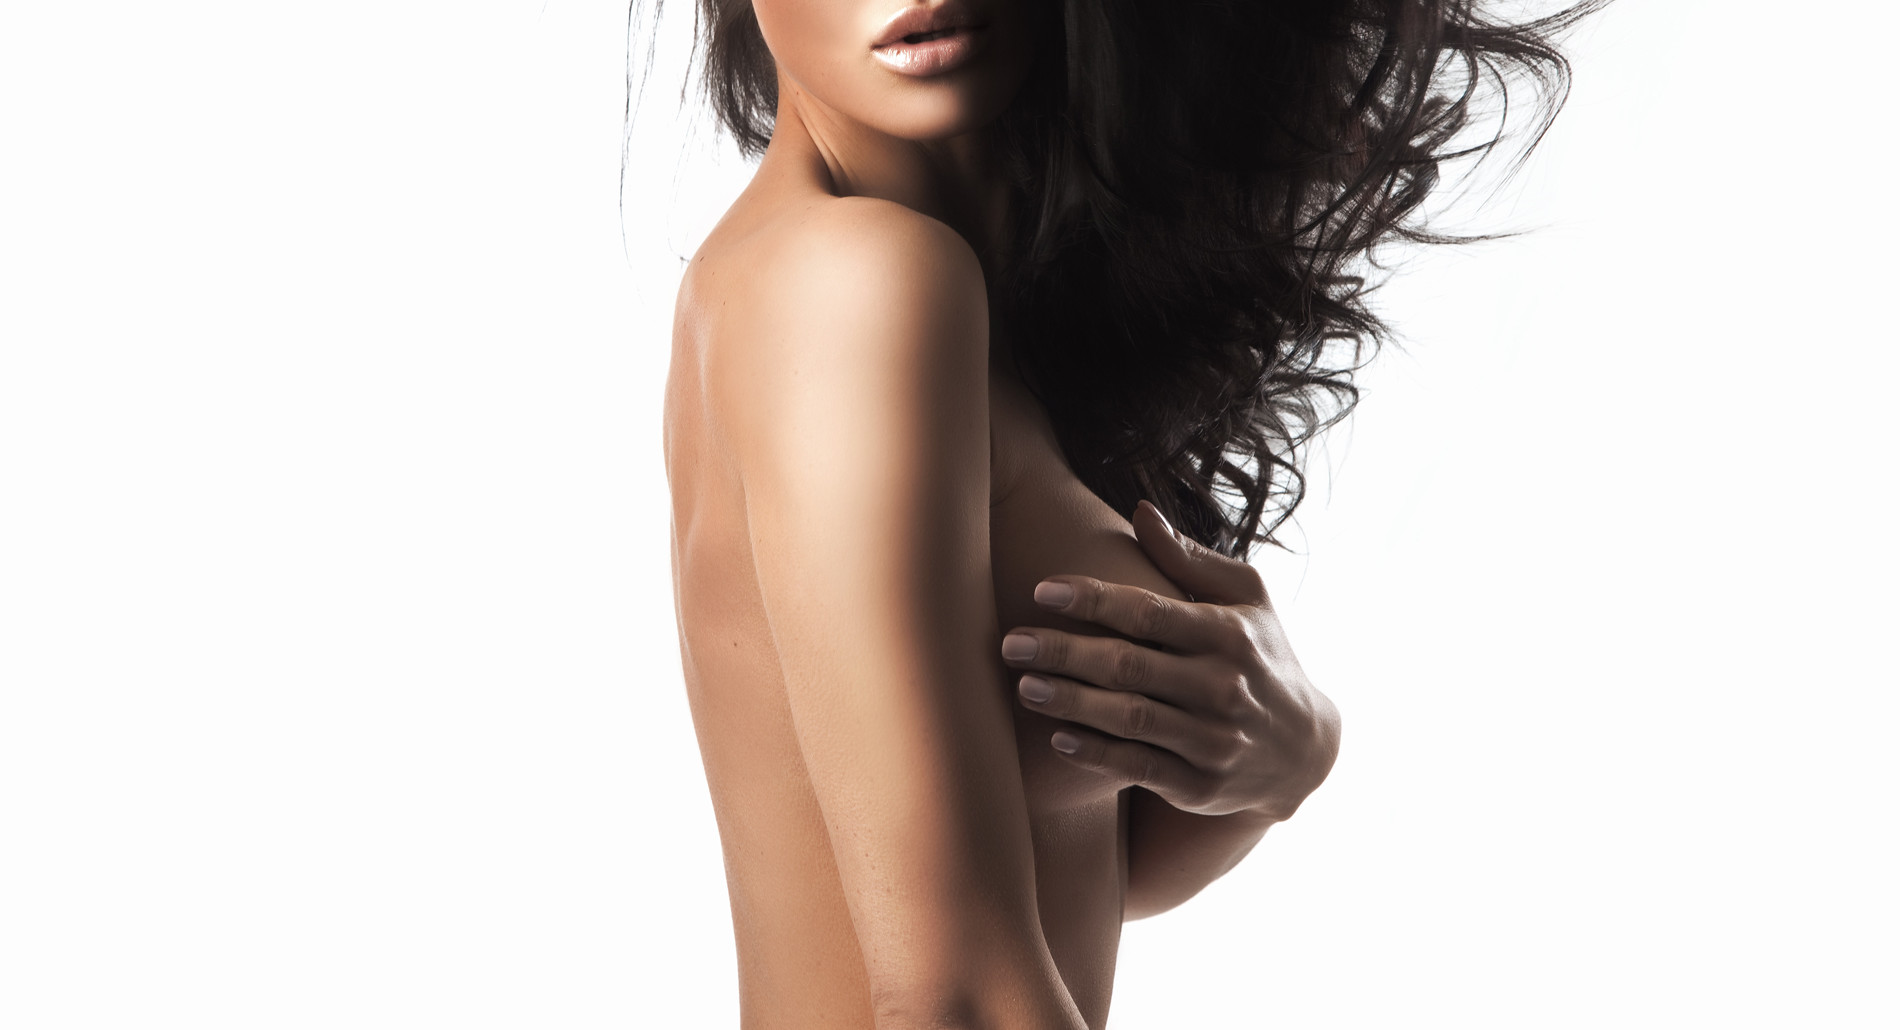 Elevación de senos